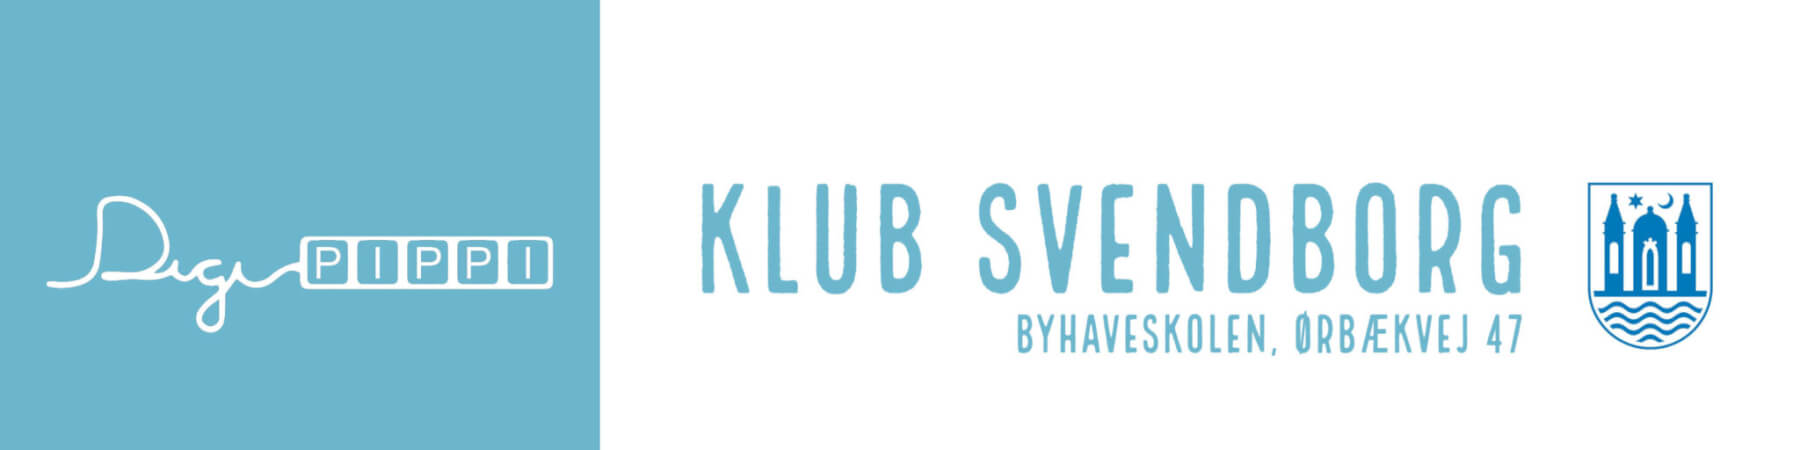 DigiPippi club Svendborg